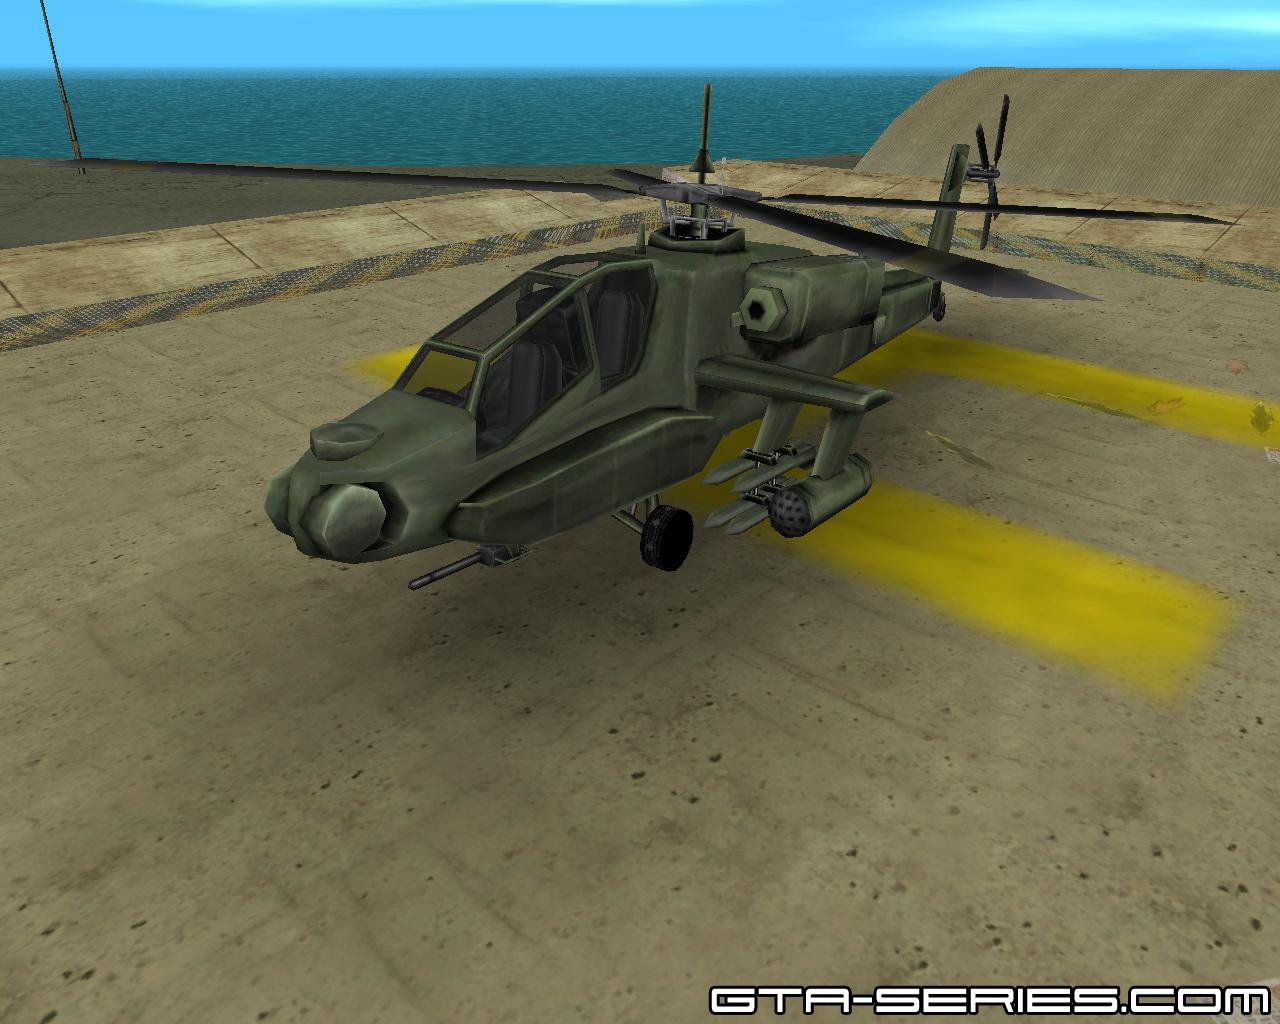 Elicottero Usato : Gta series.com » gta: vice city » velivoli